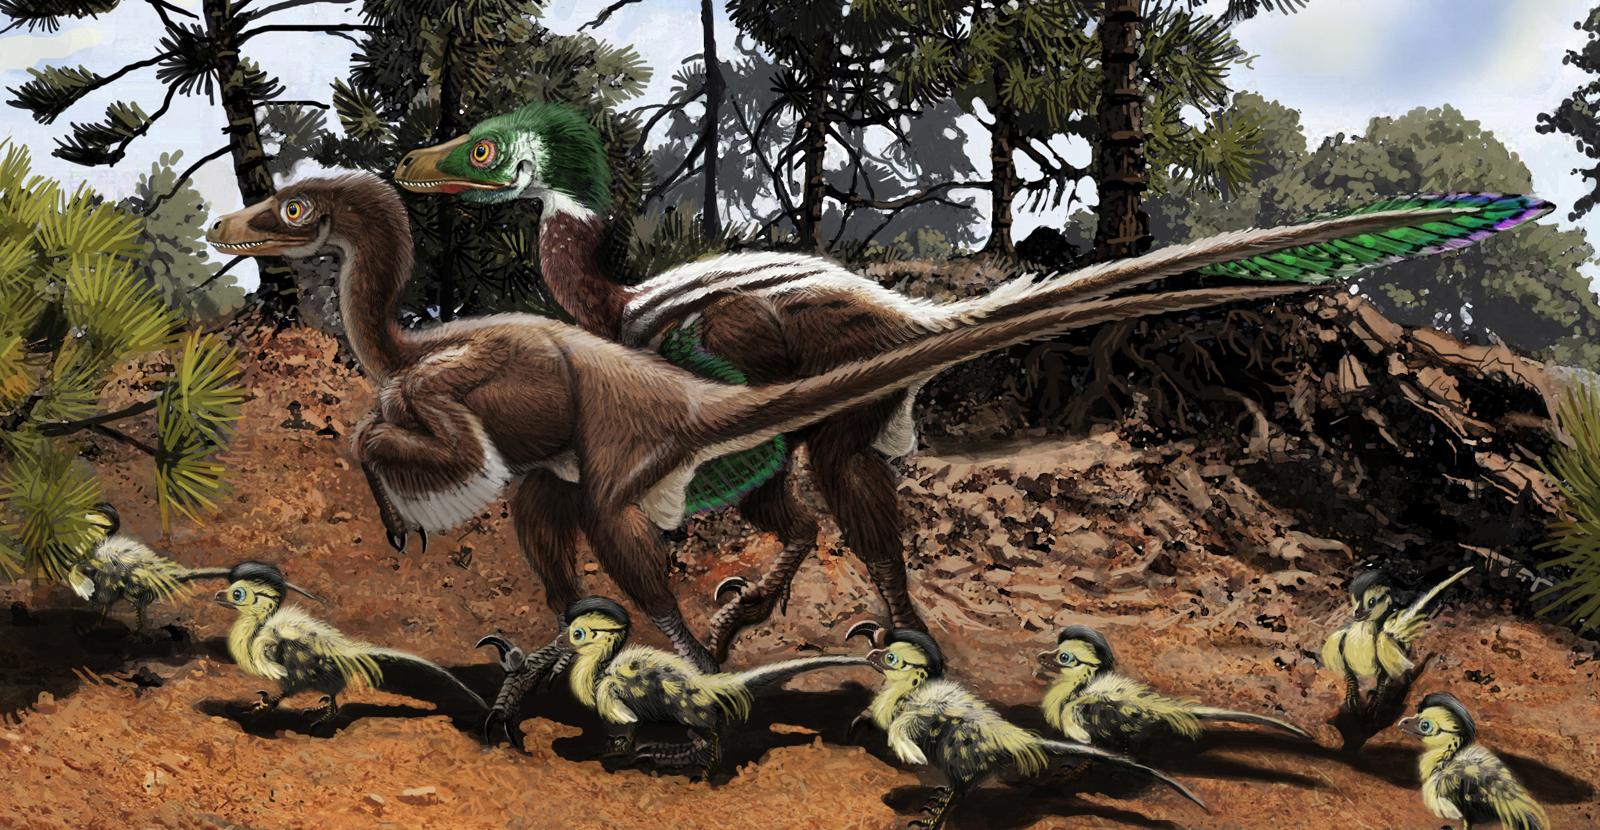 dromaeosaurus albertensis dromaeosaurus is the dinosaur which lent itsJurassic Fight Club Dromaeosaurus